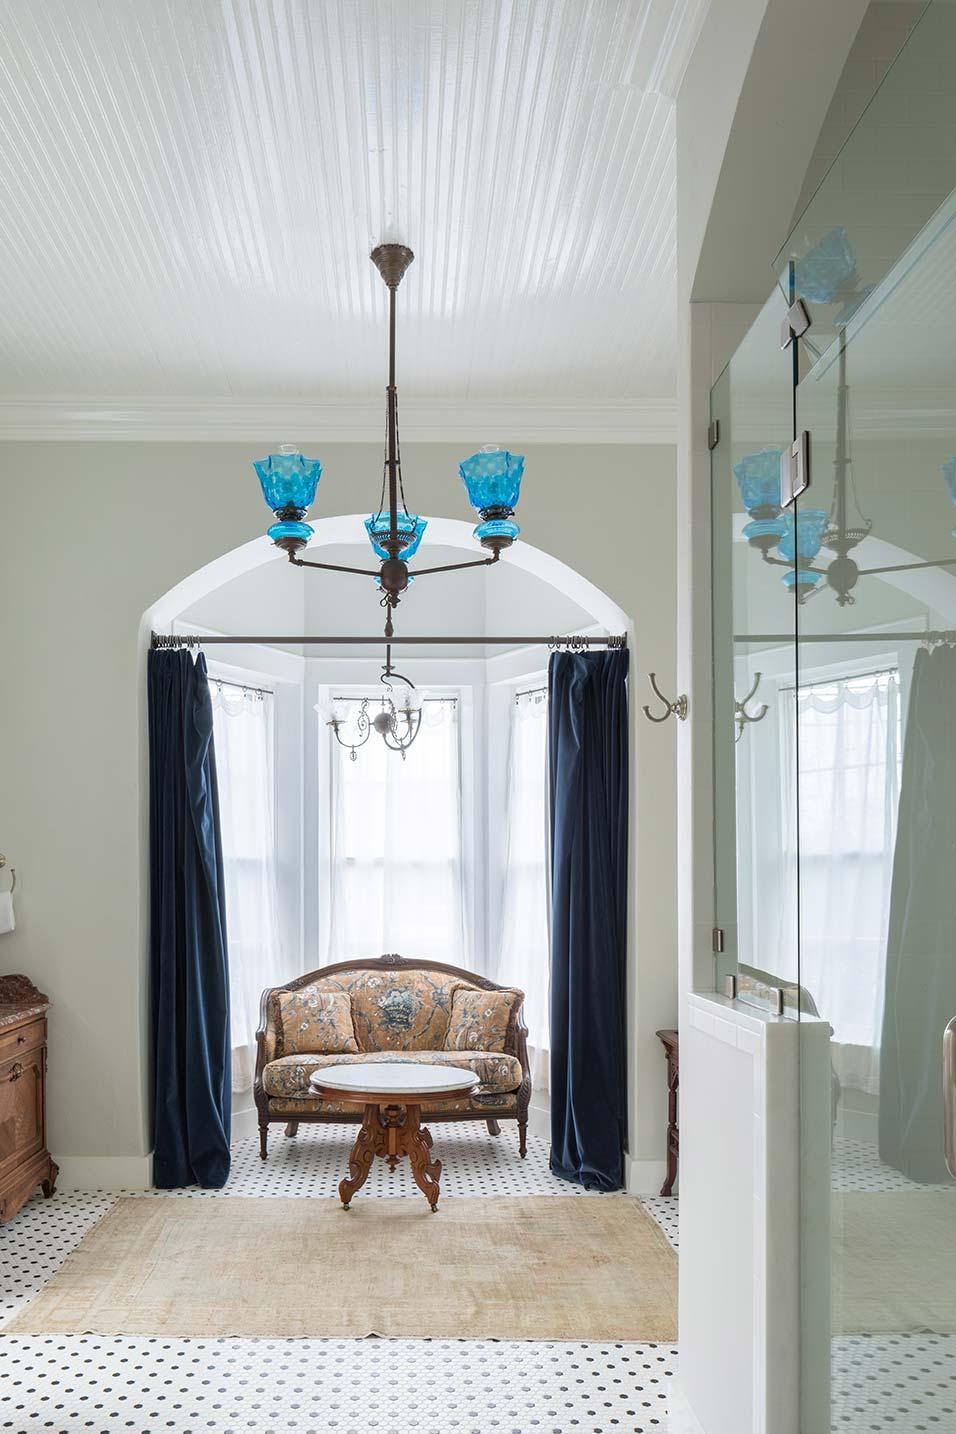 blacksmith-quarters-fredericksburg-realty-texas-commercial-real-estate-for-wedding-venue-tourism-investment.jpg